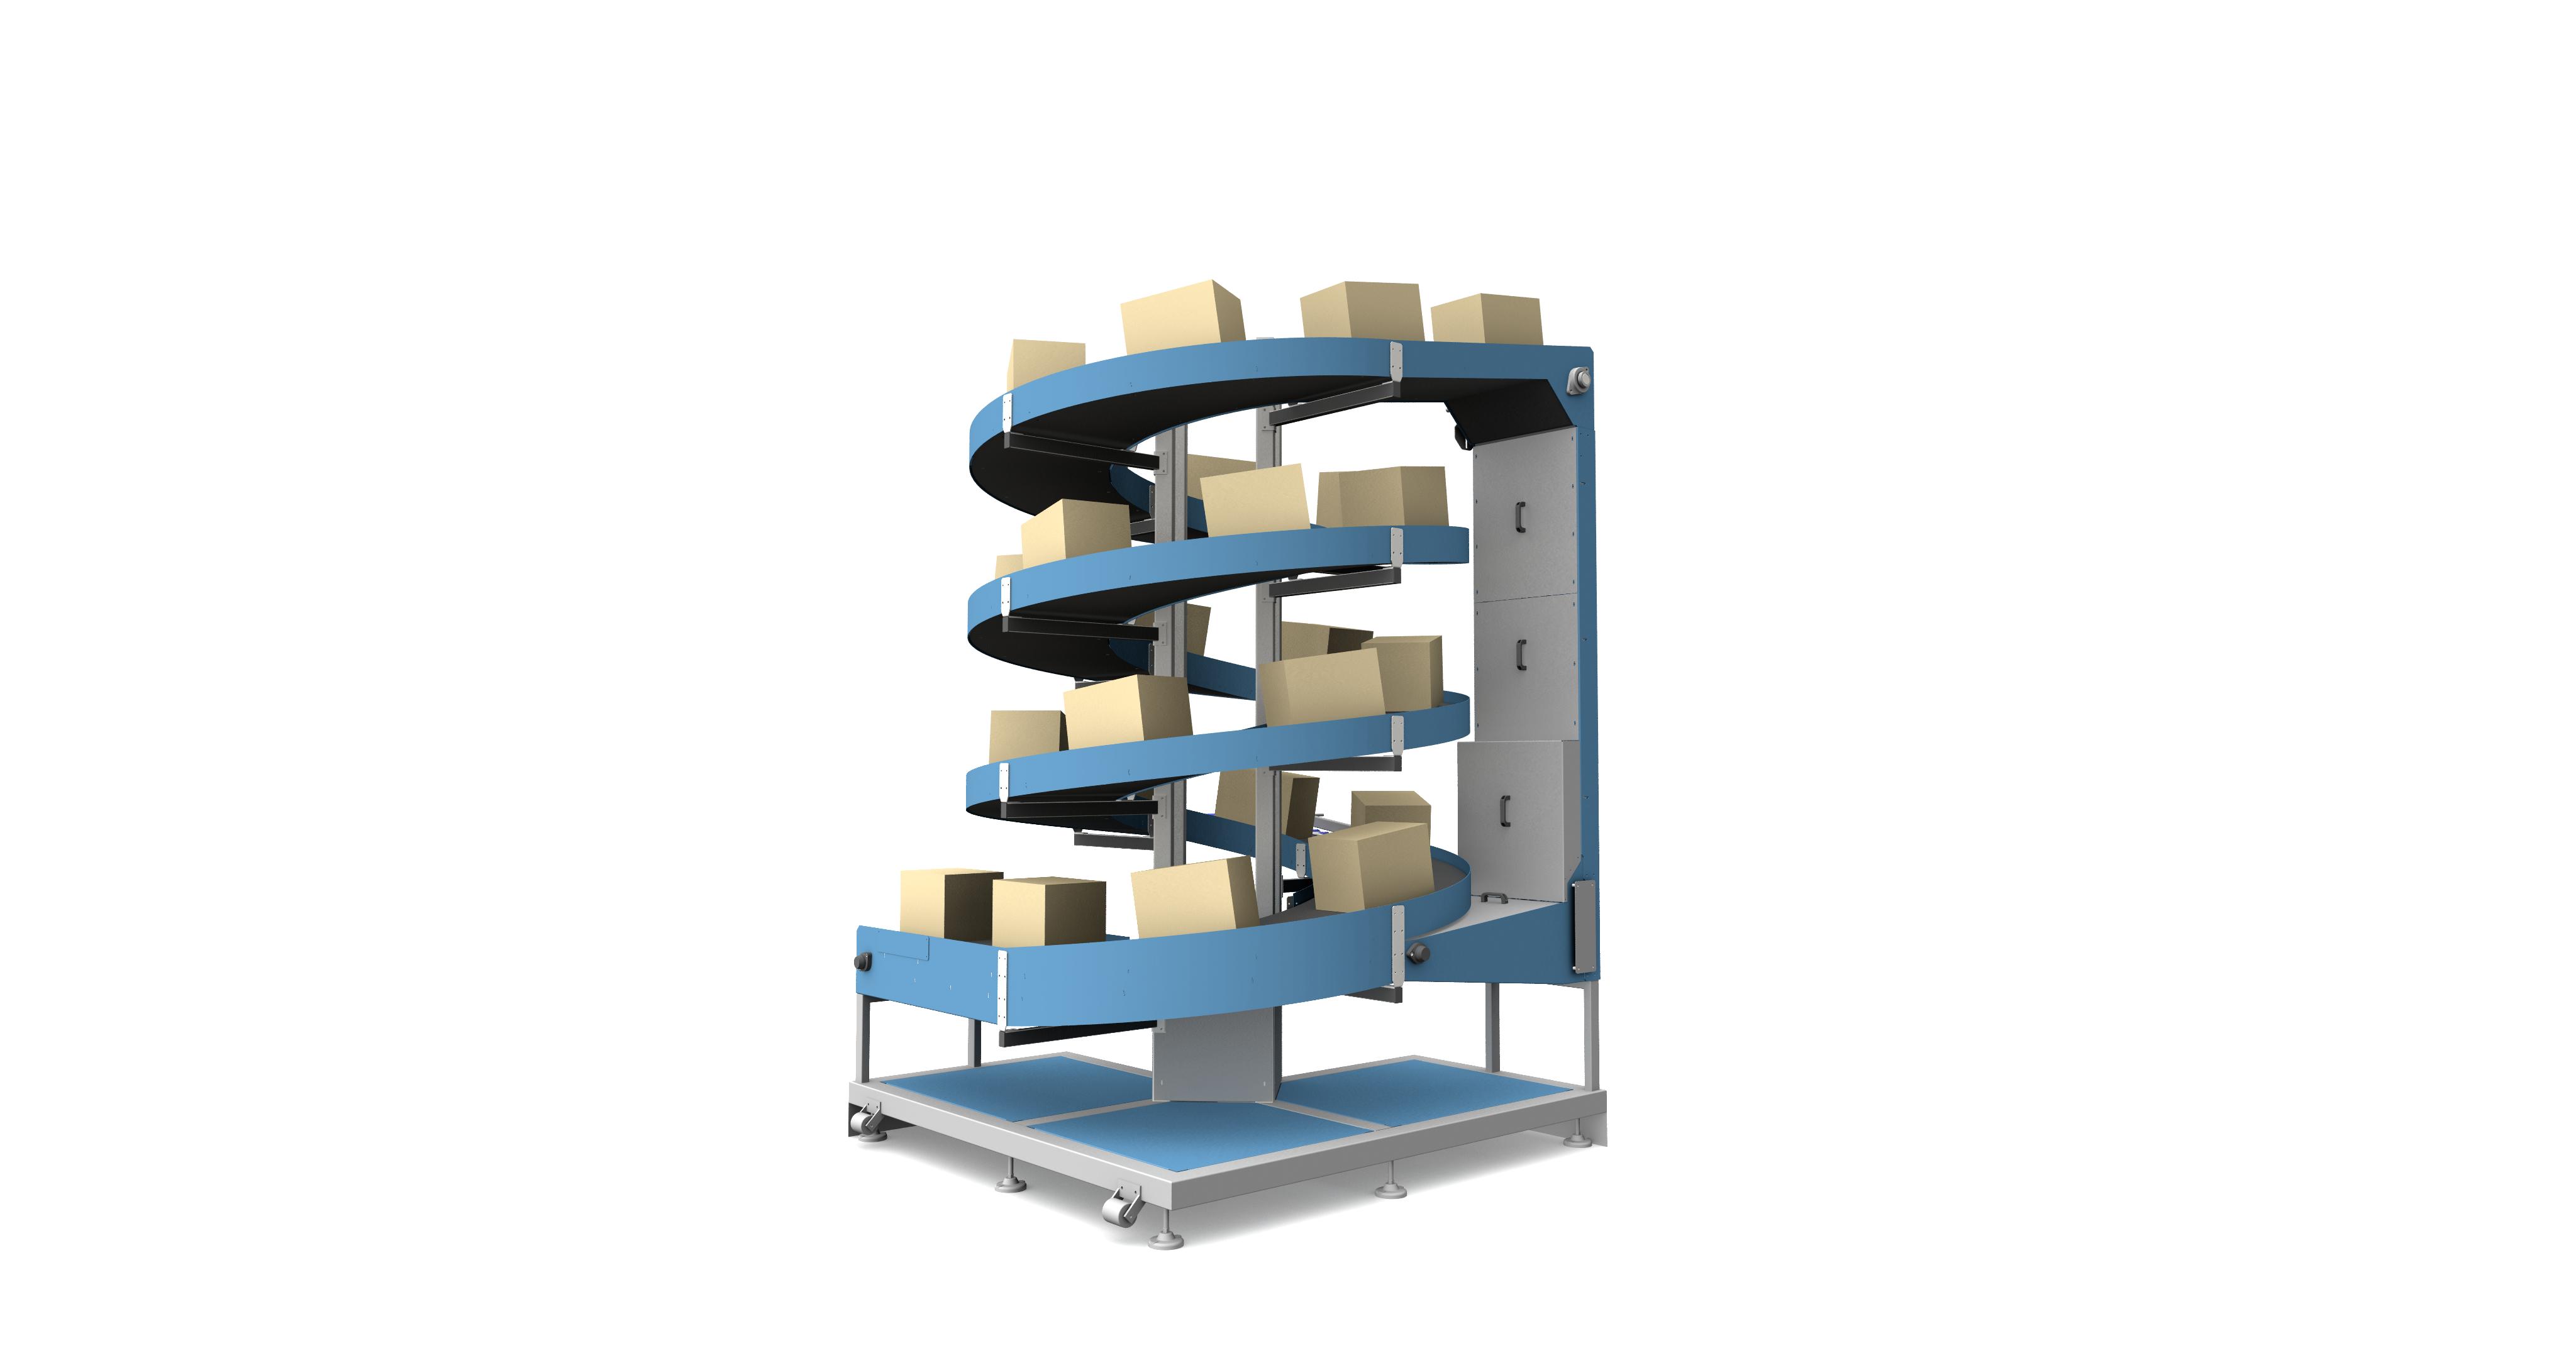 3D model of Spiral Elevators for Warehouse & Logistics Applications